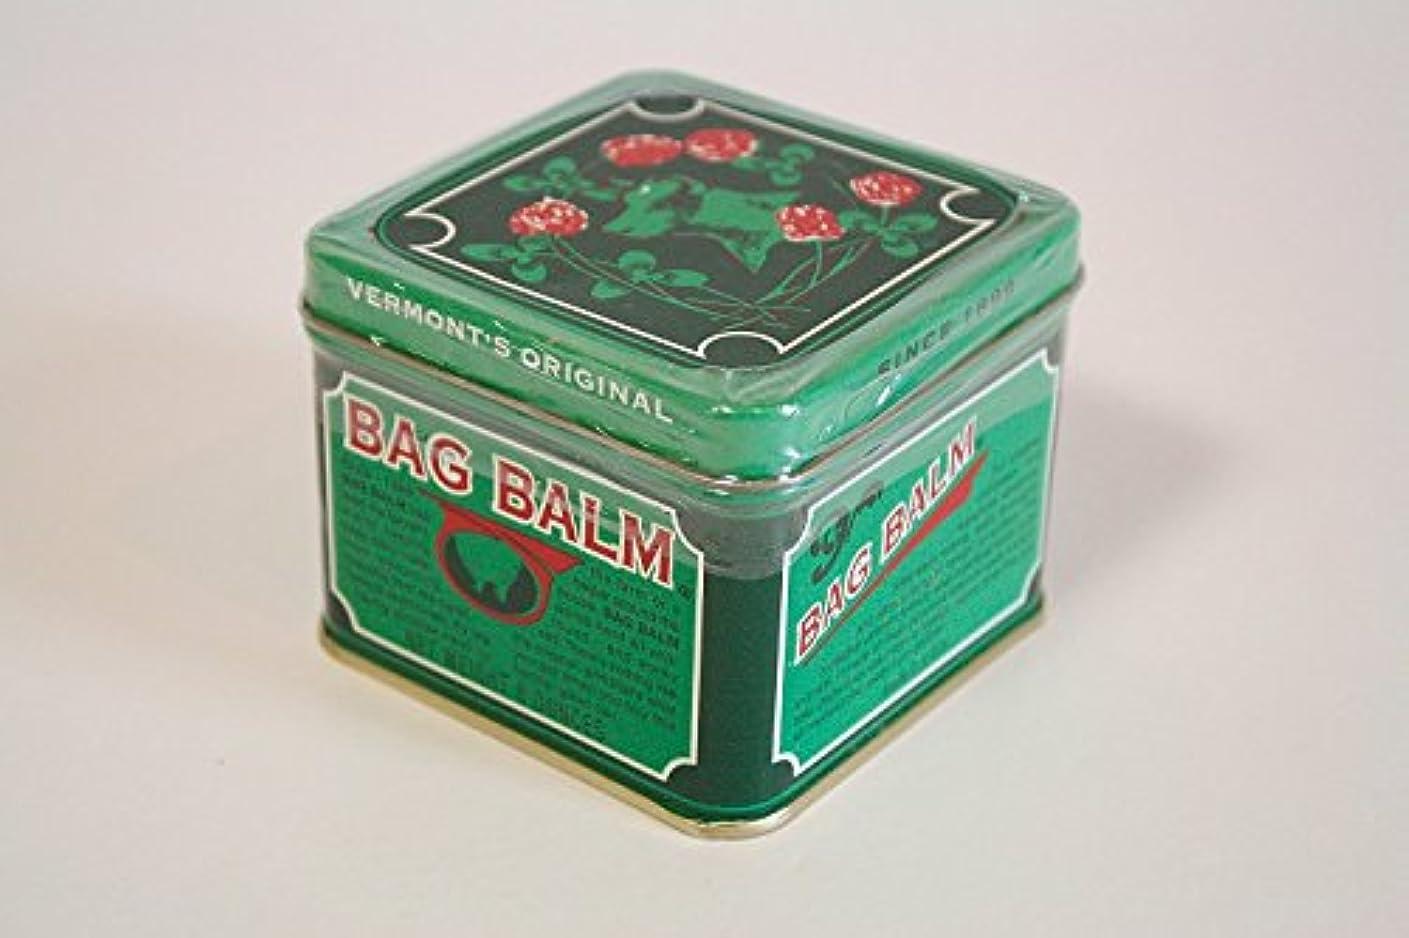 Bag Balm バッグバーム 8oz 保湿クリーム Vermont's Original バーモントオリジナル[並行輸入品]